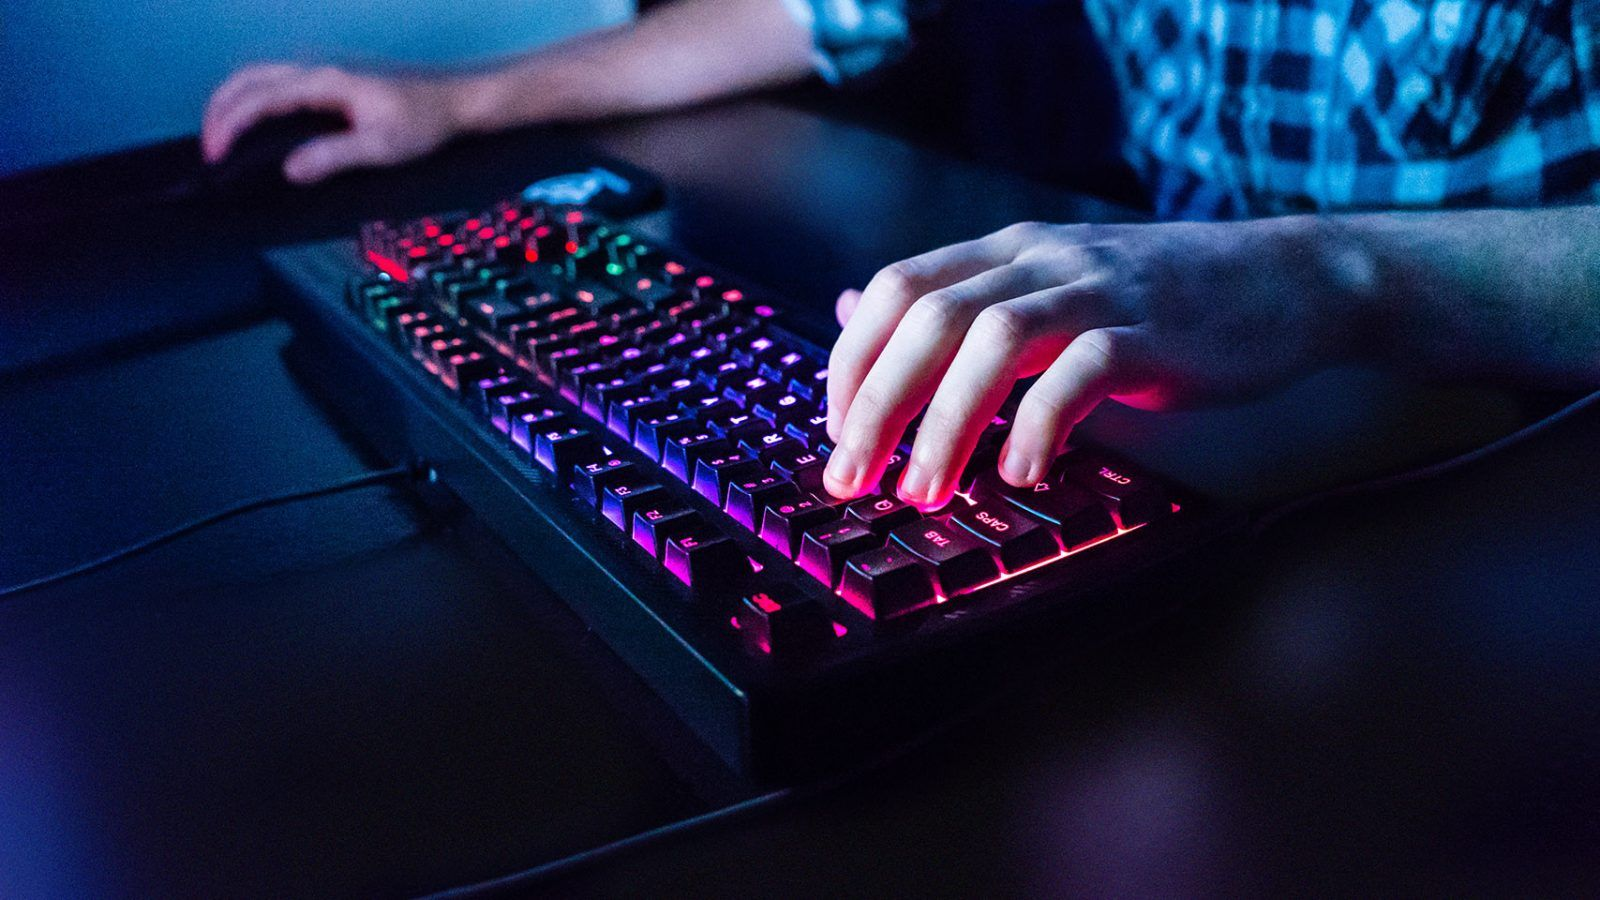 Gaming Keyboard Wallpapers   Top Free Gaming Keyboard Backgrounds ...